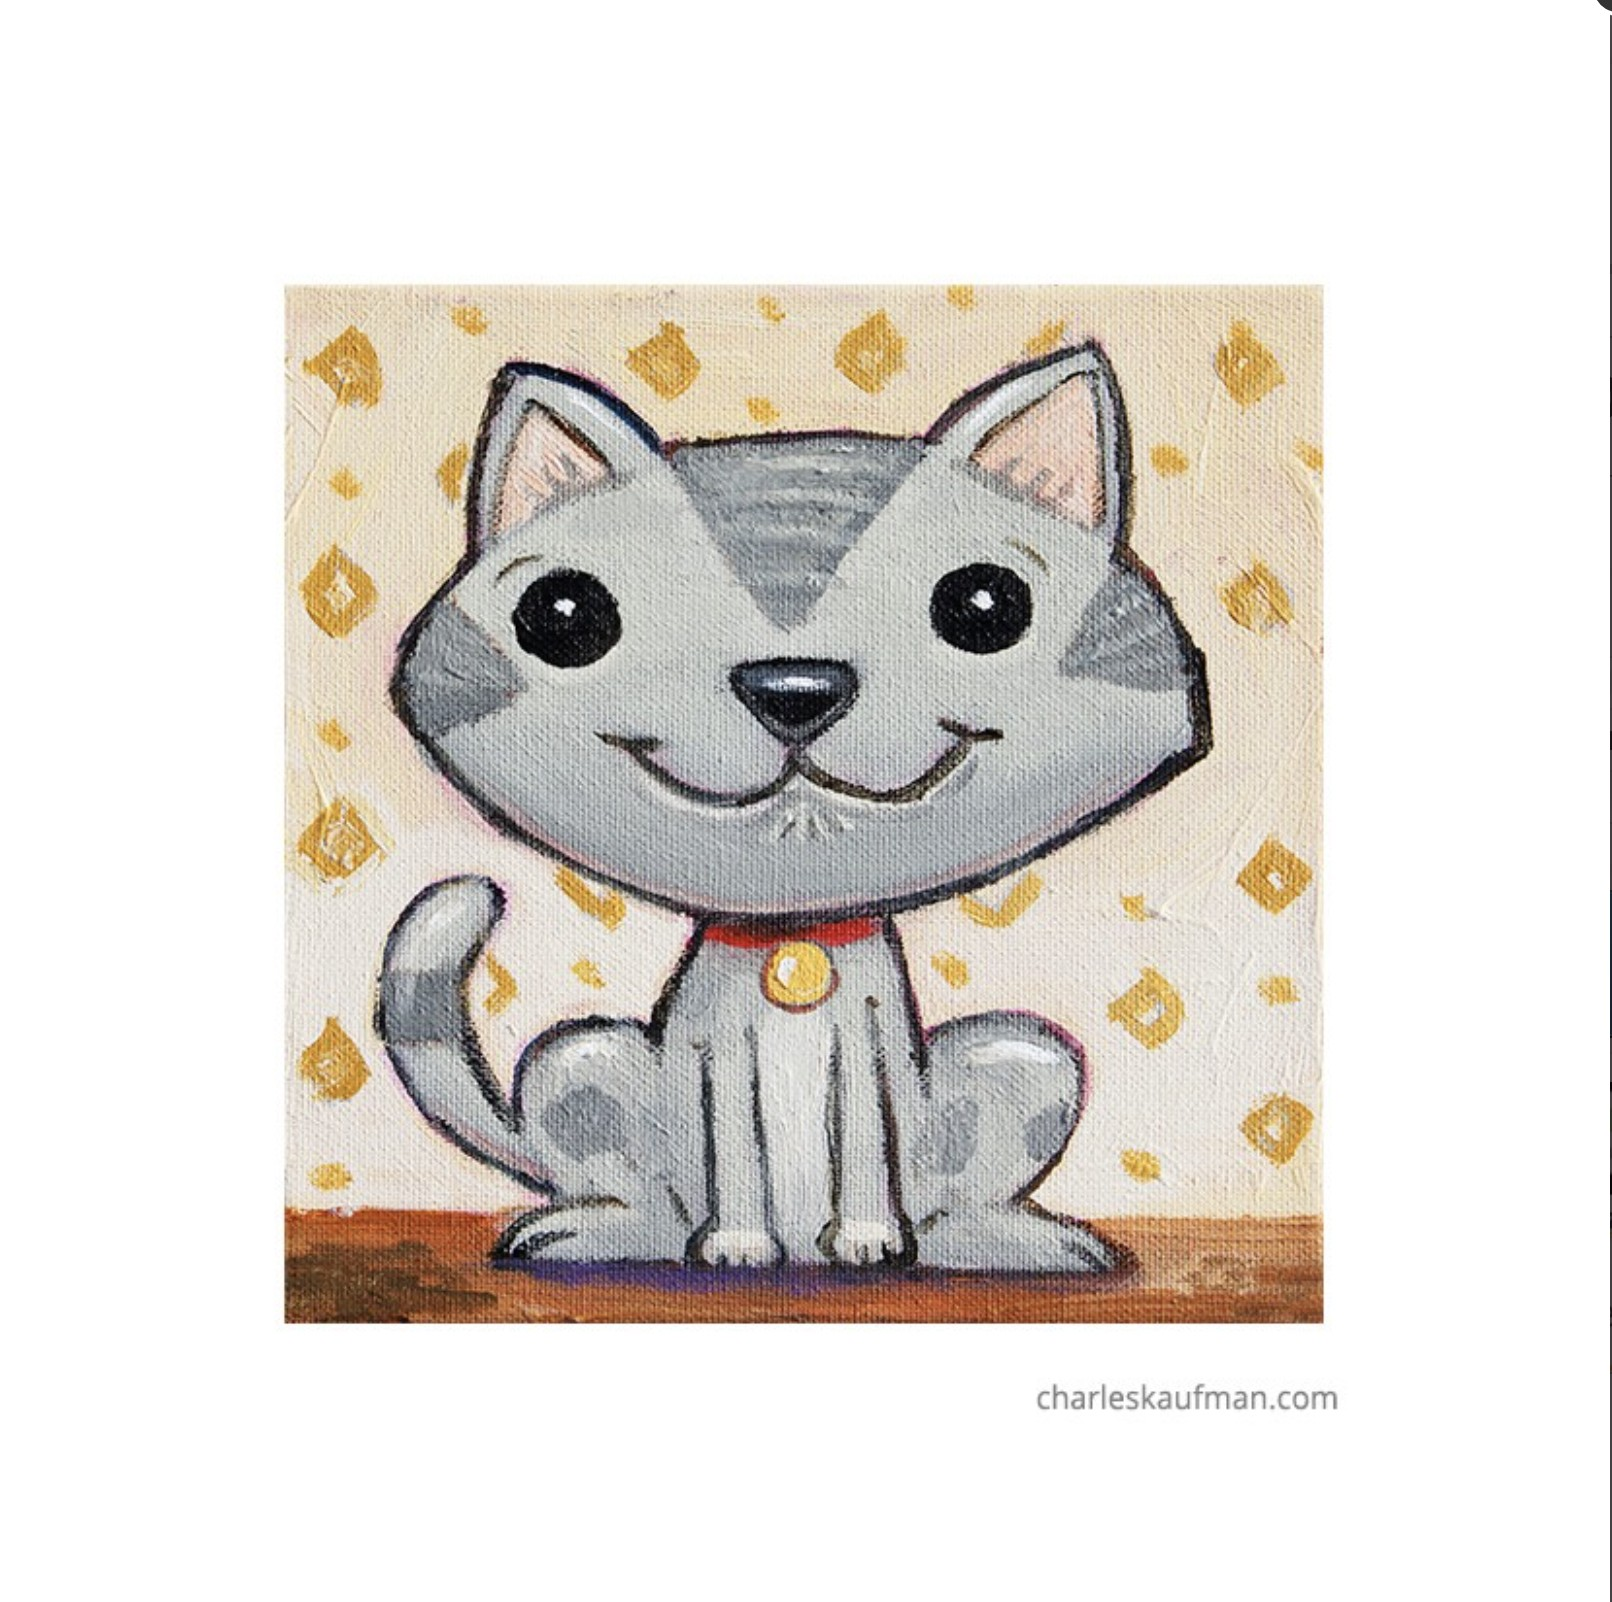 smiling grey cat - Kaufmann, Charles - k-CHK385